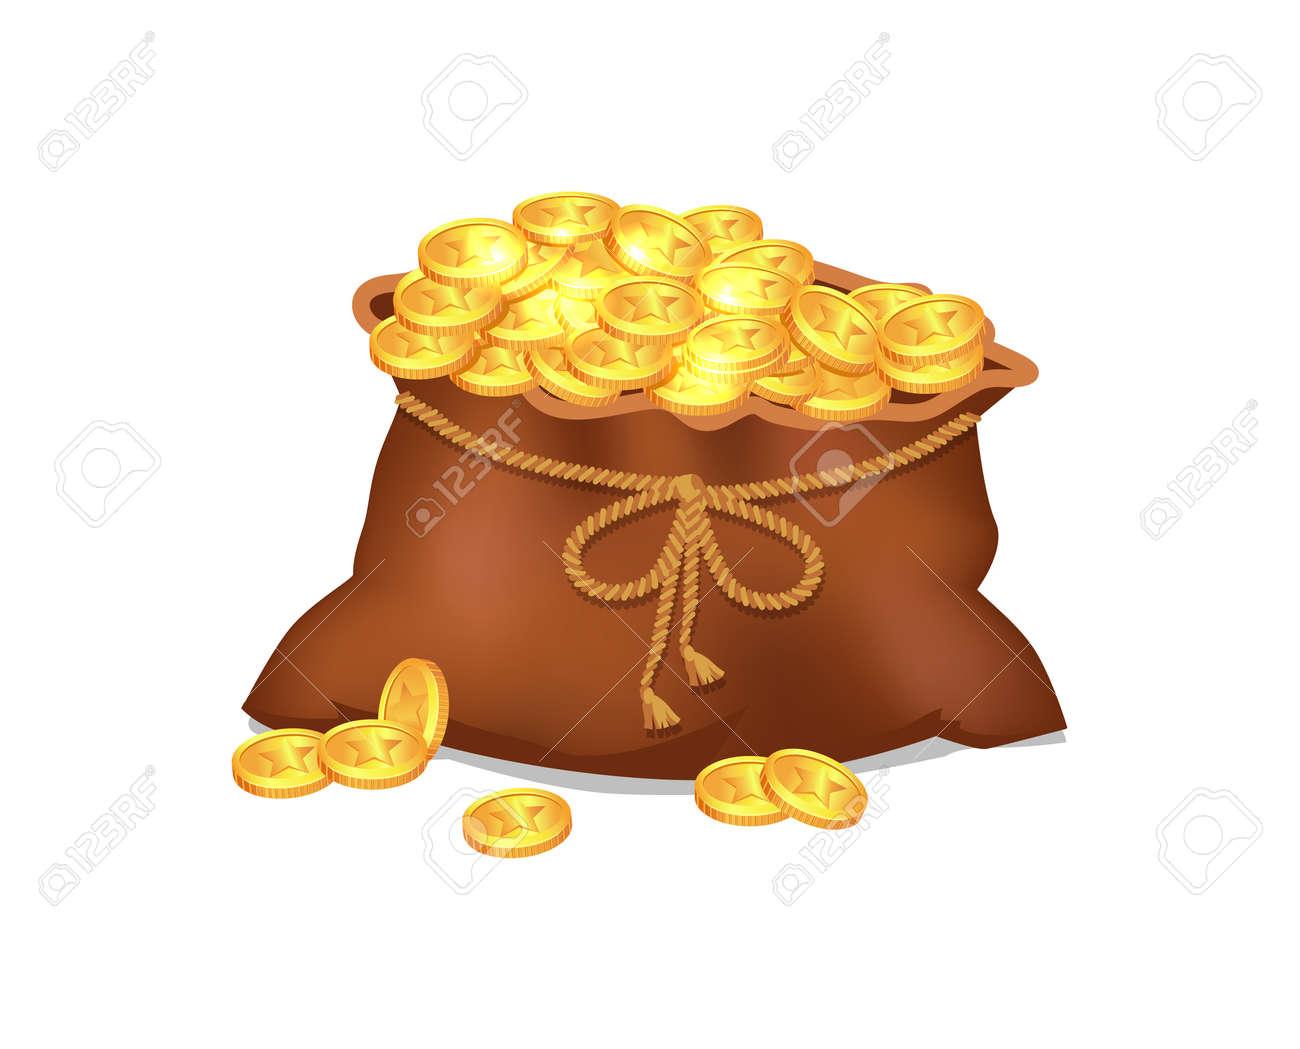 Treasure Coins in Brown Bag Vector Illustration - 95373540